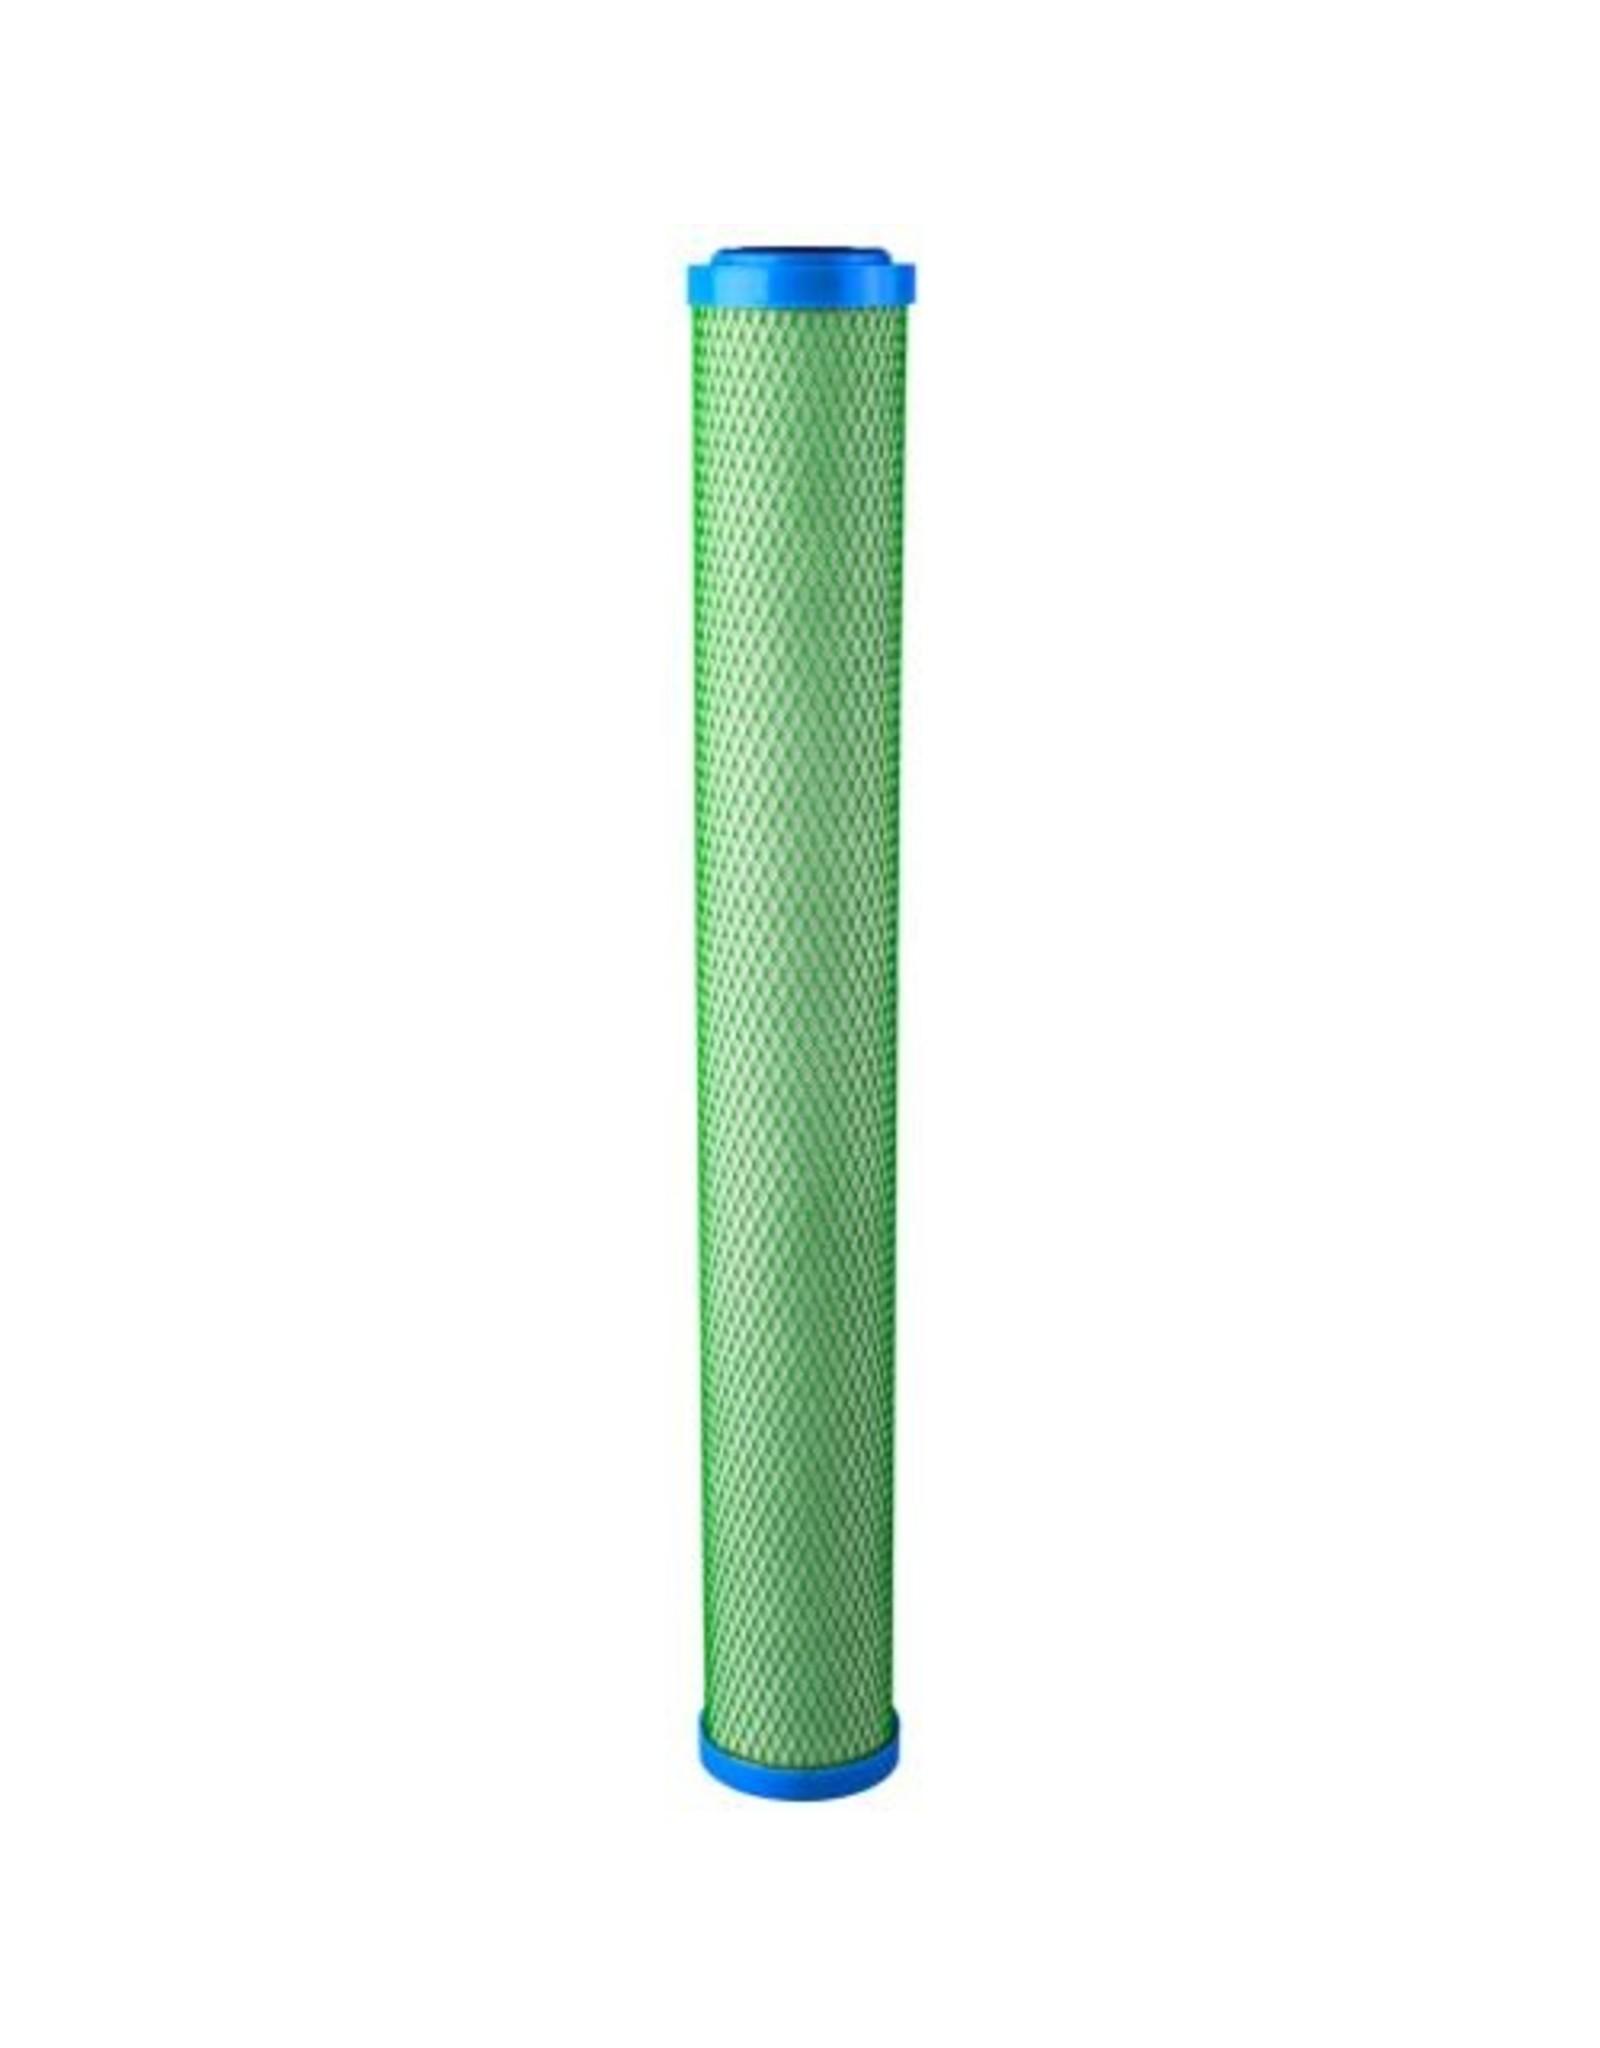 Premium Green Coconut Carbon Filter 2 In X 20 In